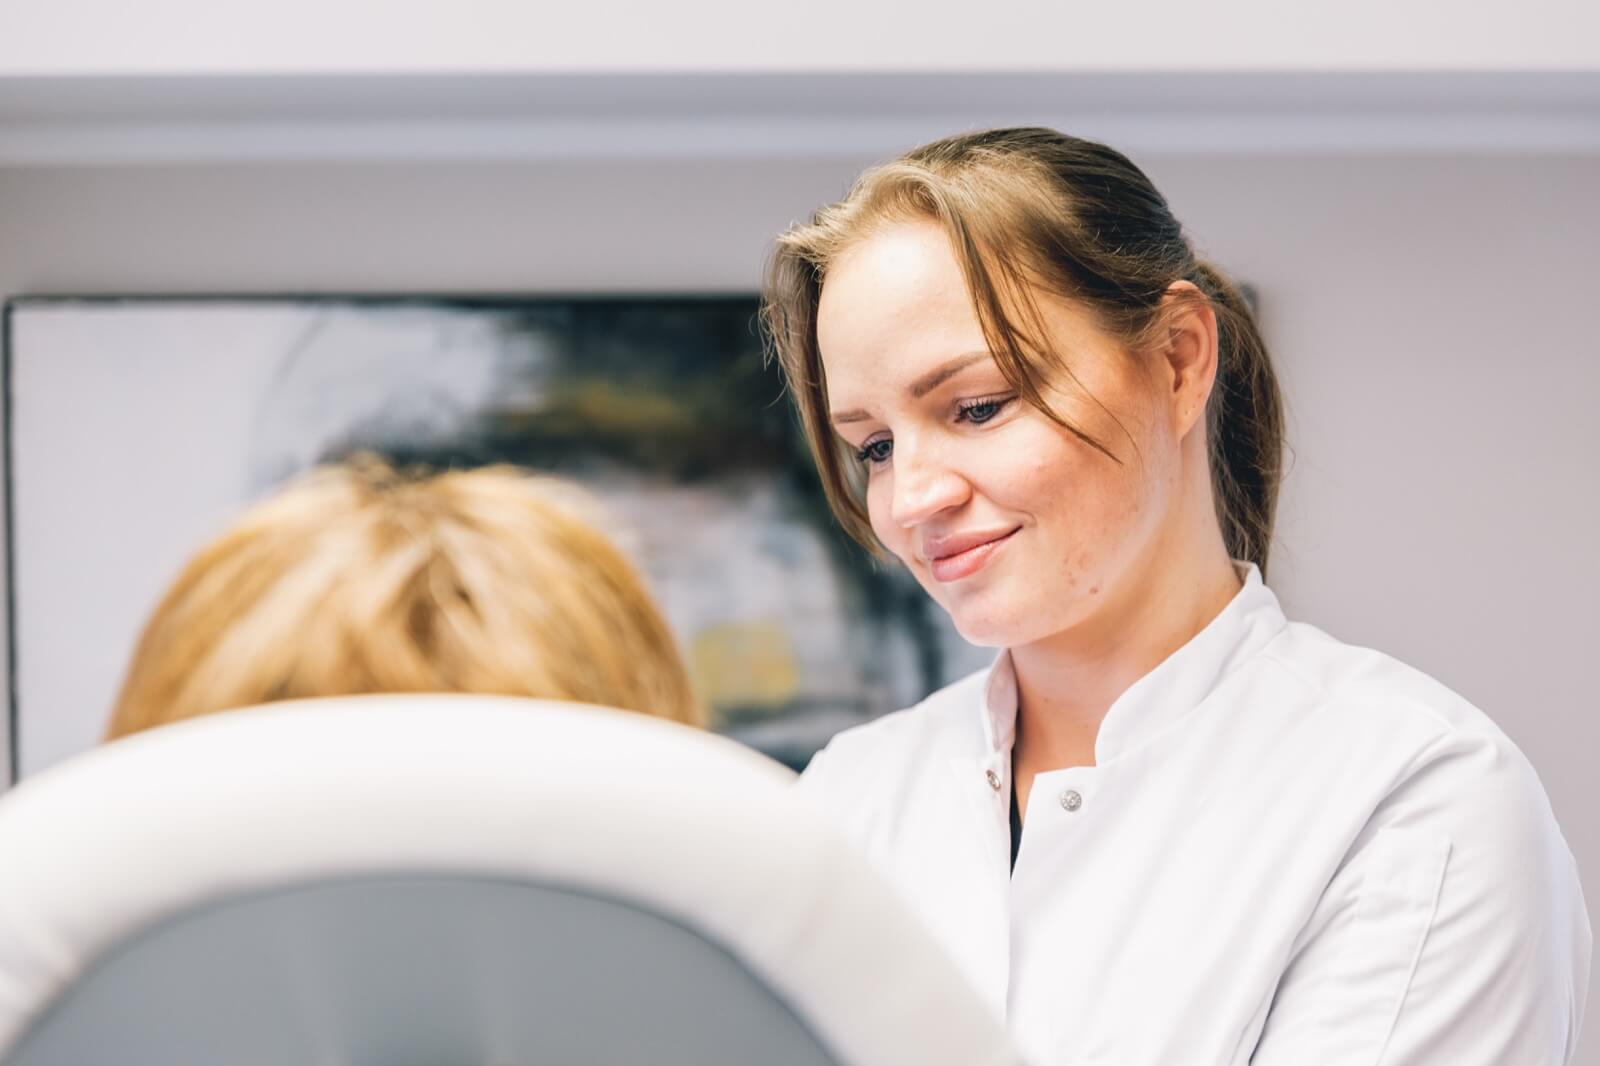 irene klein behandeling wallen body clinic